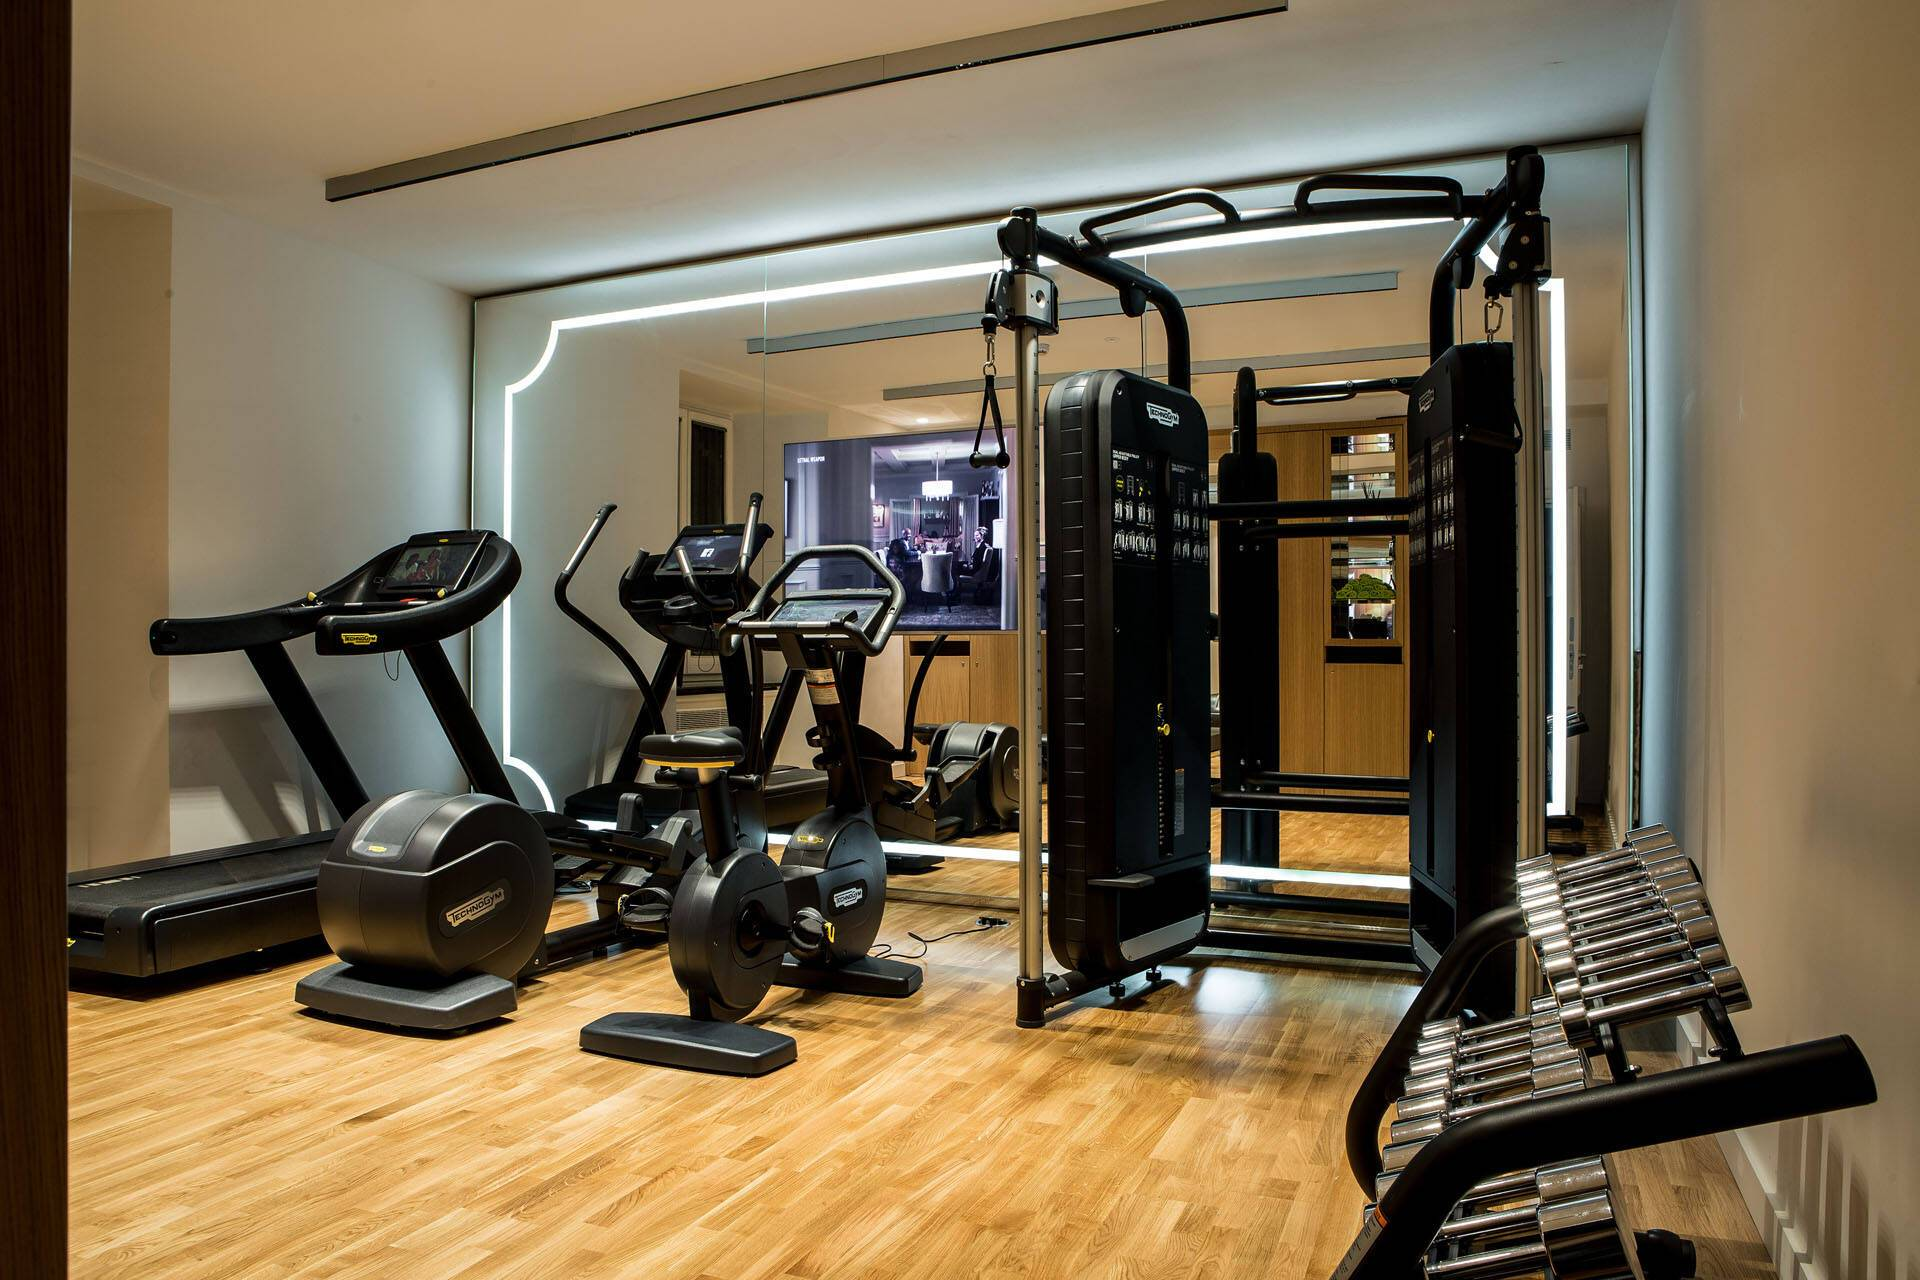 Sofitel Villa Borghese Rome Fitness Center